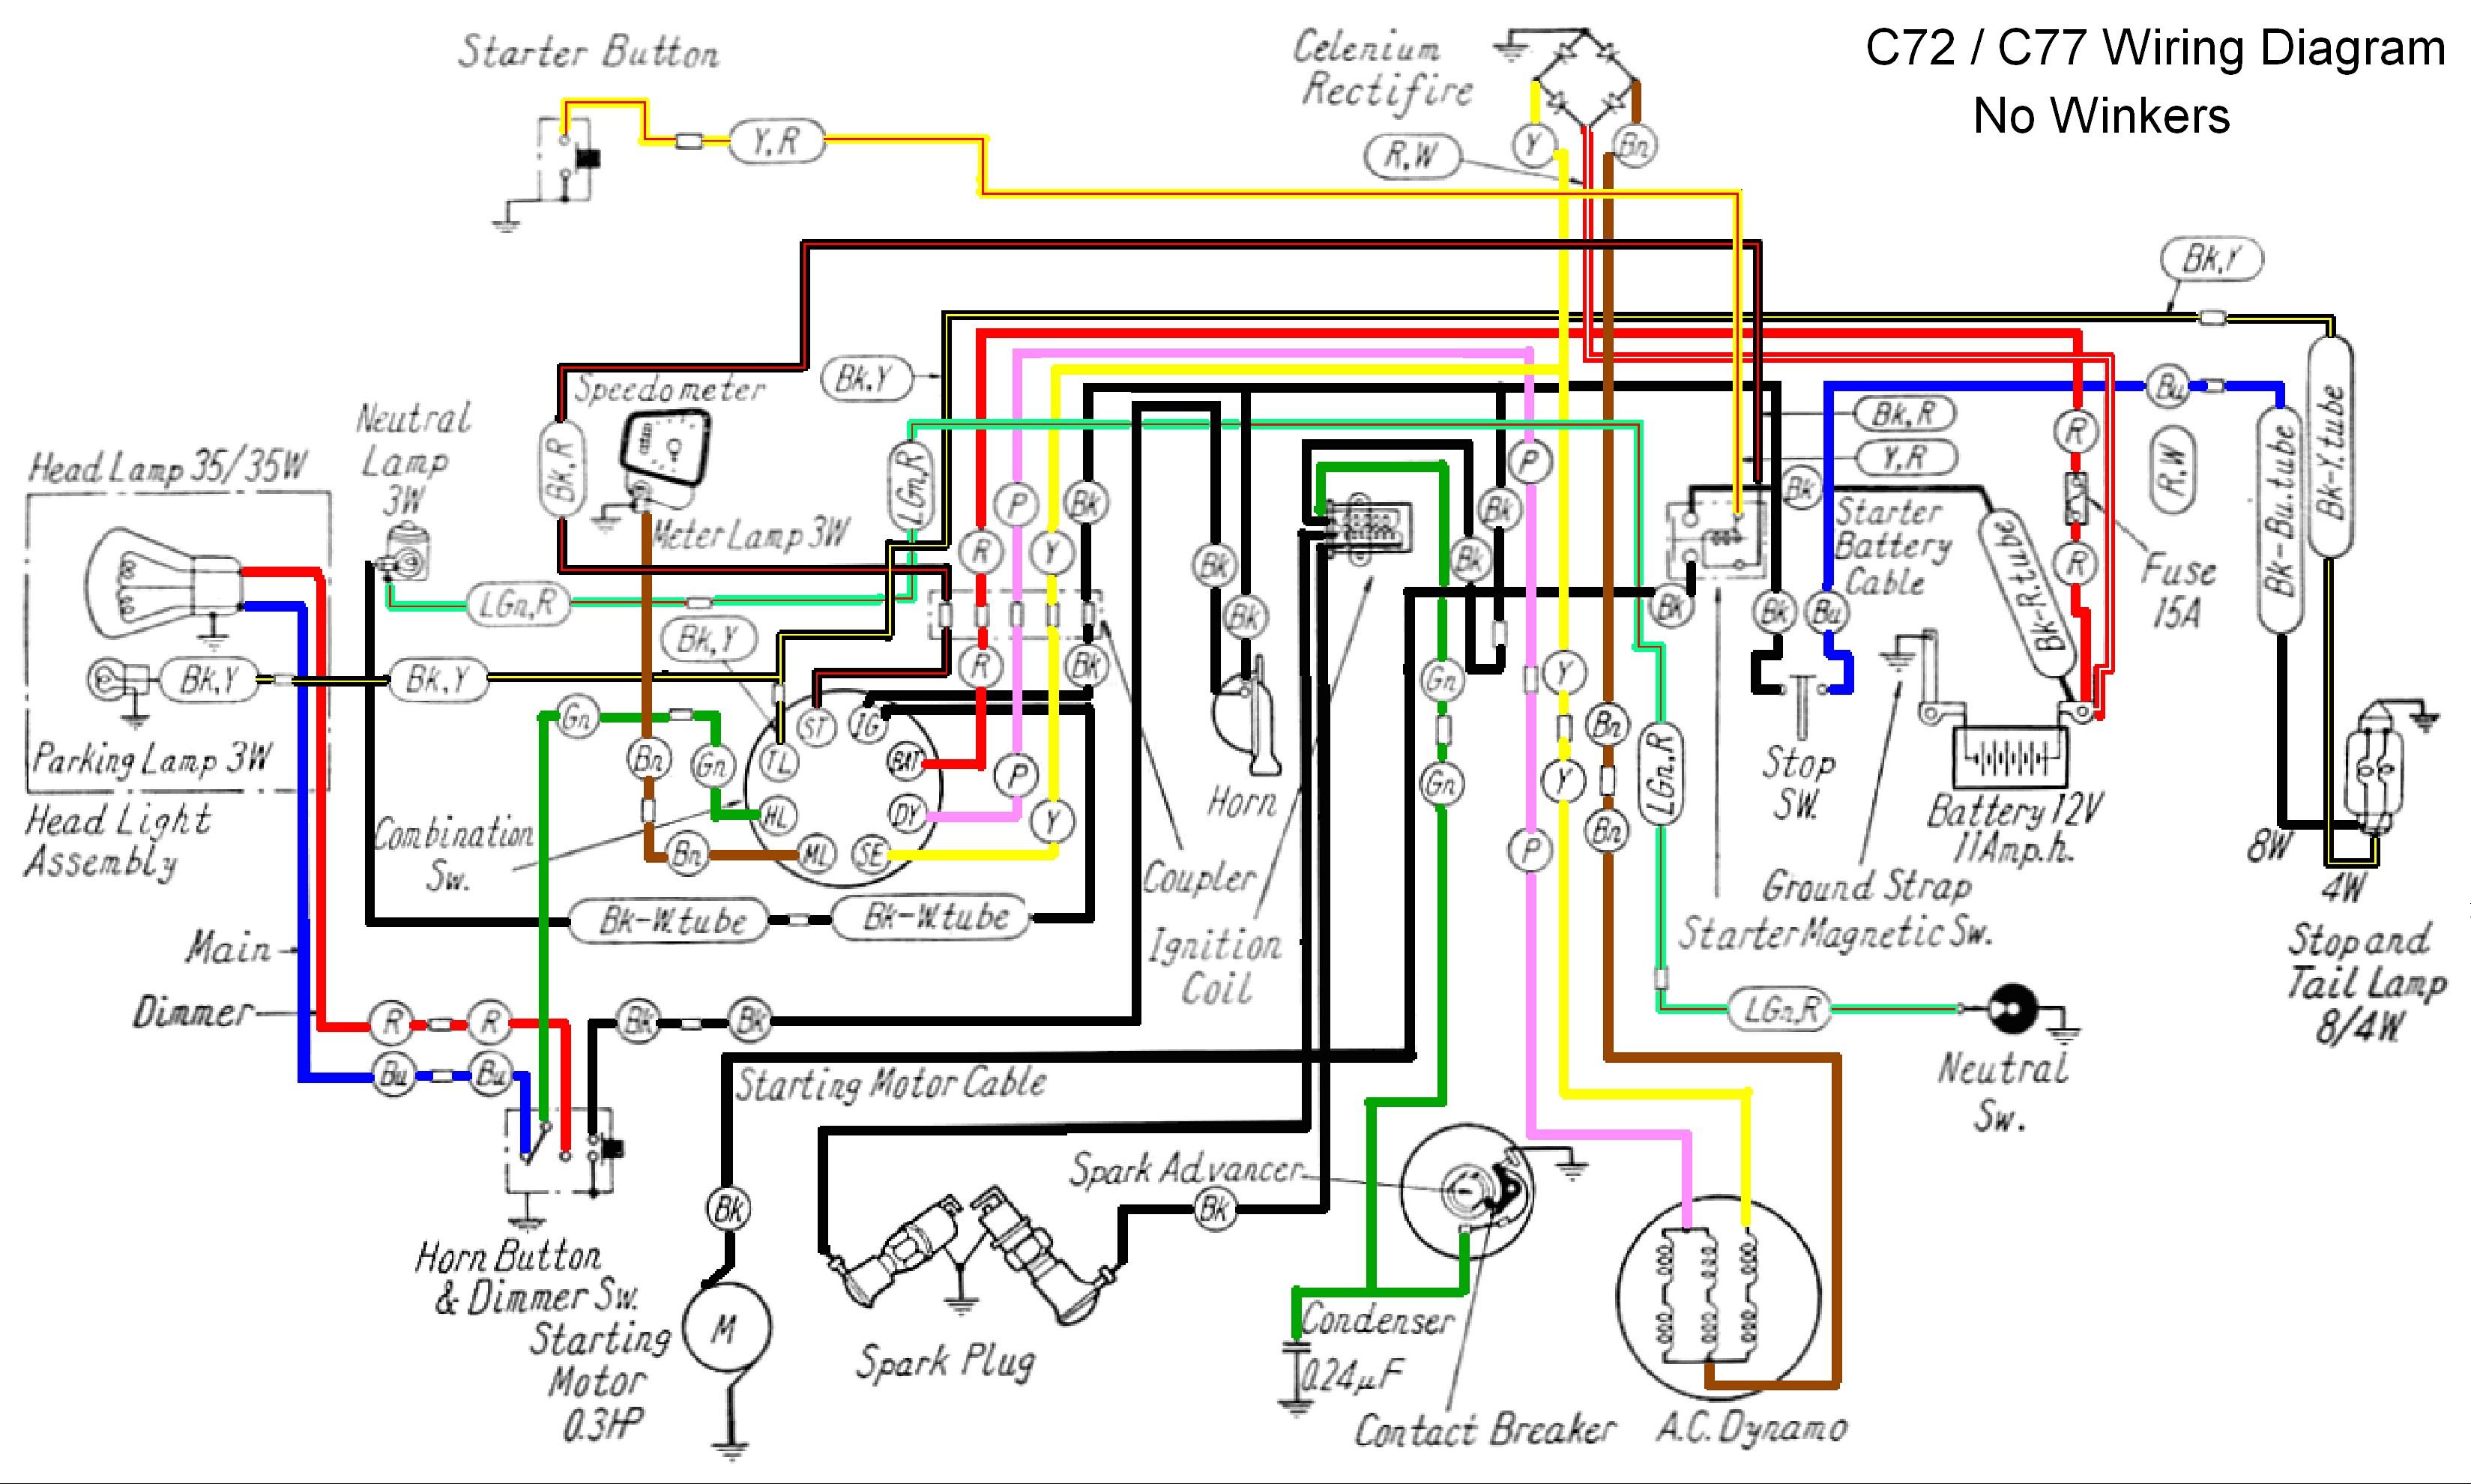 Mini Chopper Wiring Diagram - Wiring Diagram | Spider Mini Chopper Wiring Diagram |  | Wiring Diagram